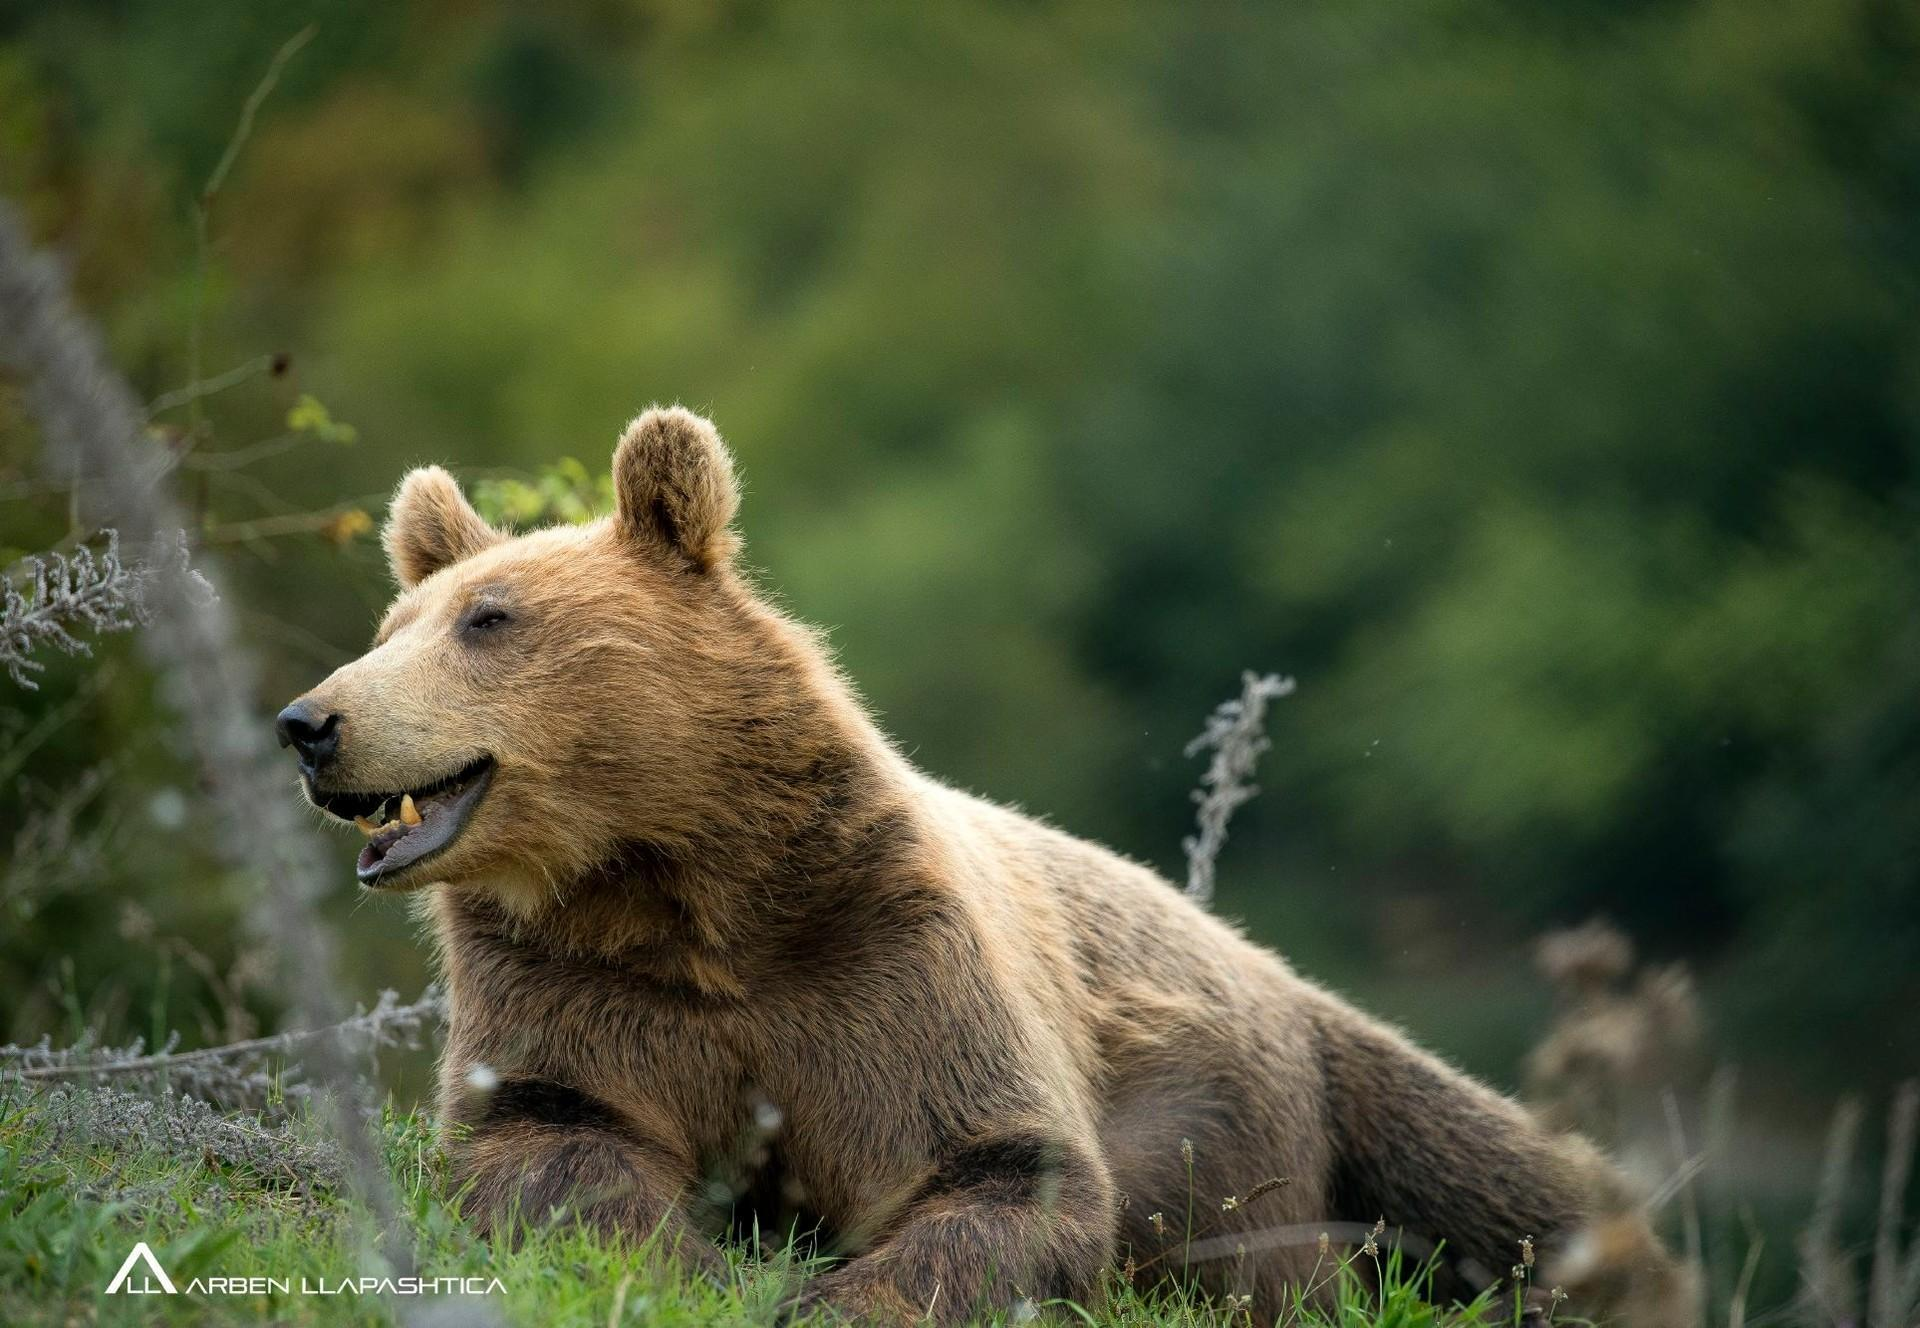 Brown bear Gjina in the grass